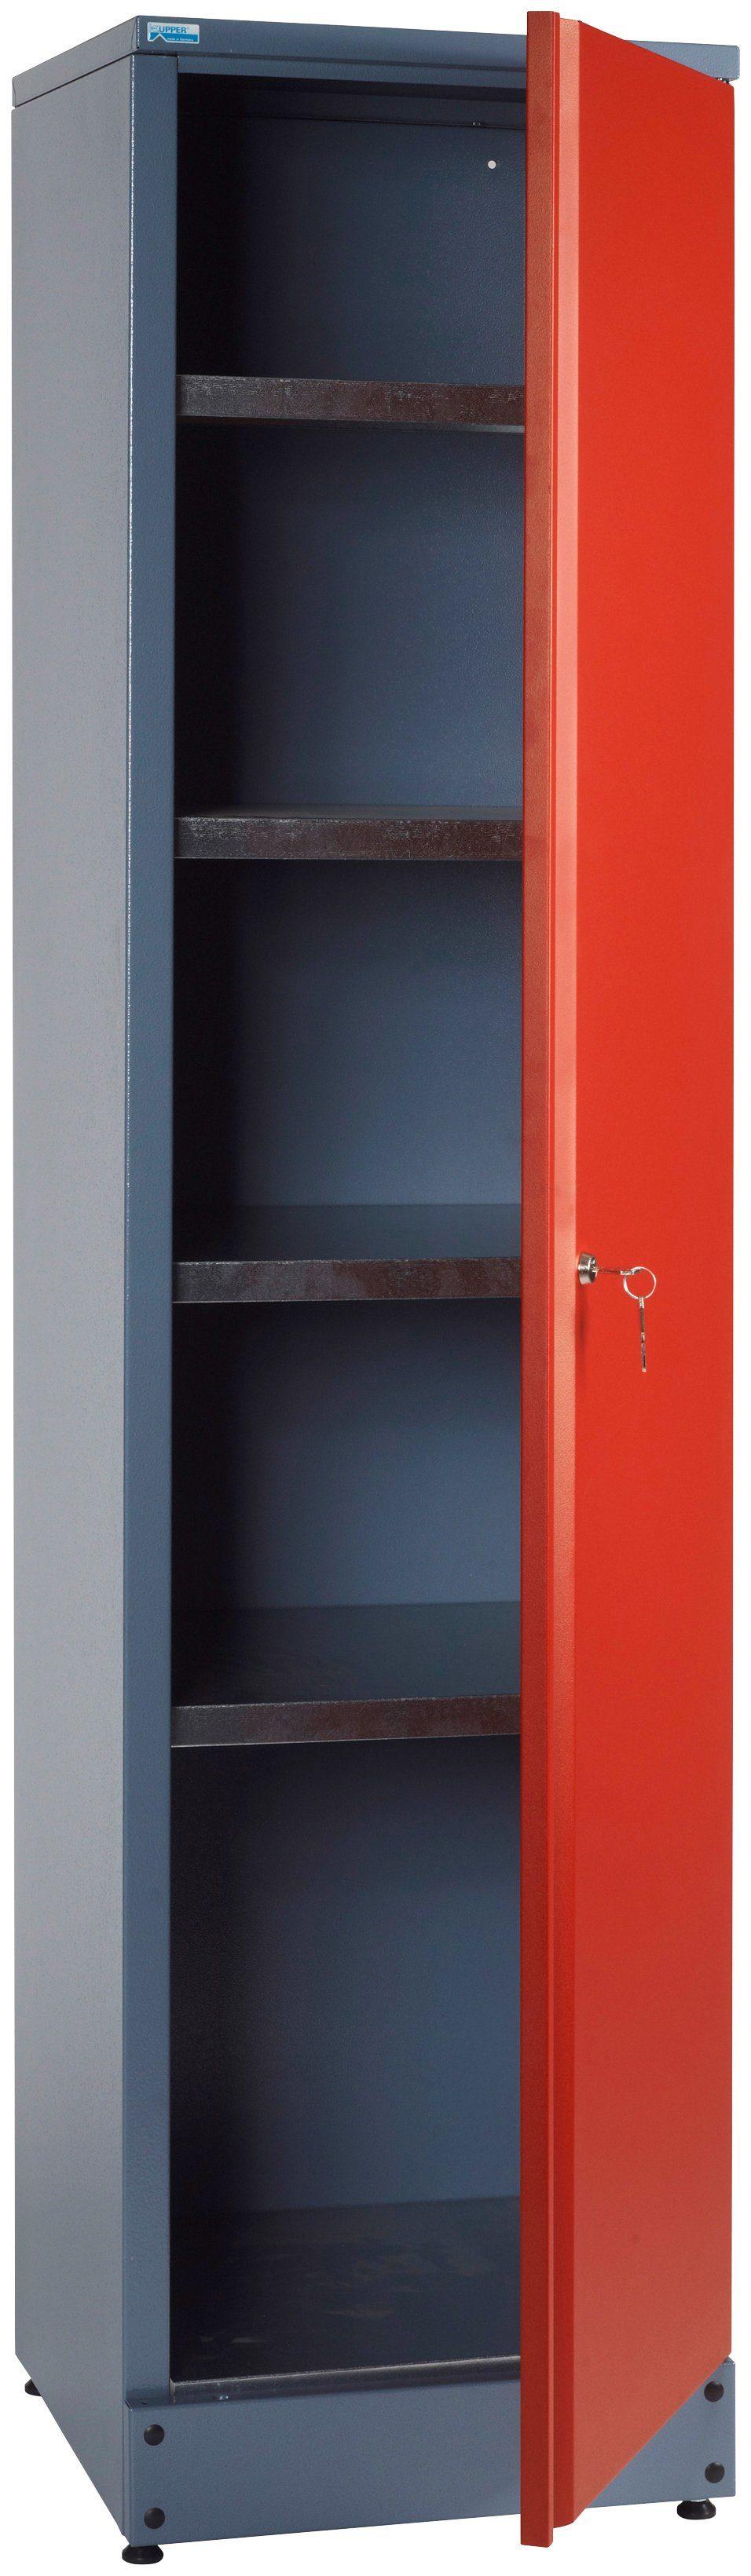 Kast Met Planken : KÜpper hoge kast deur planken in rood« online shop otto